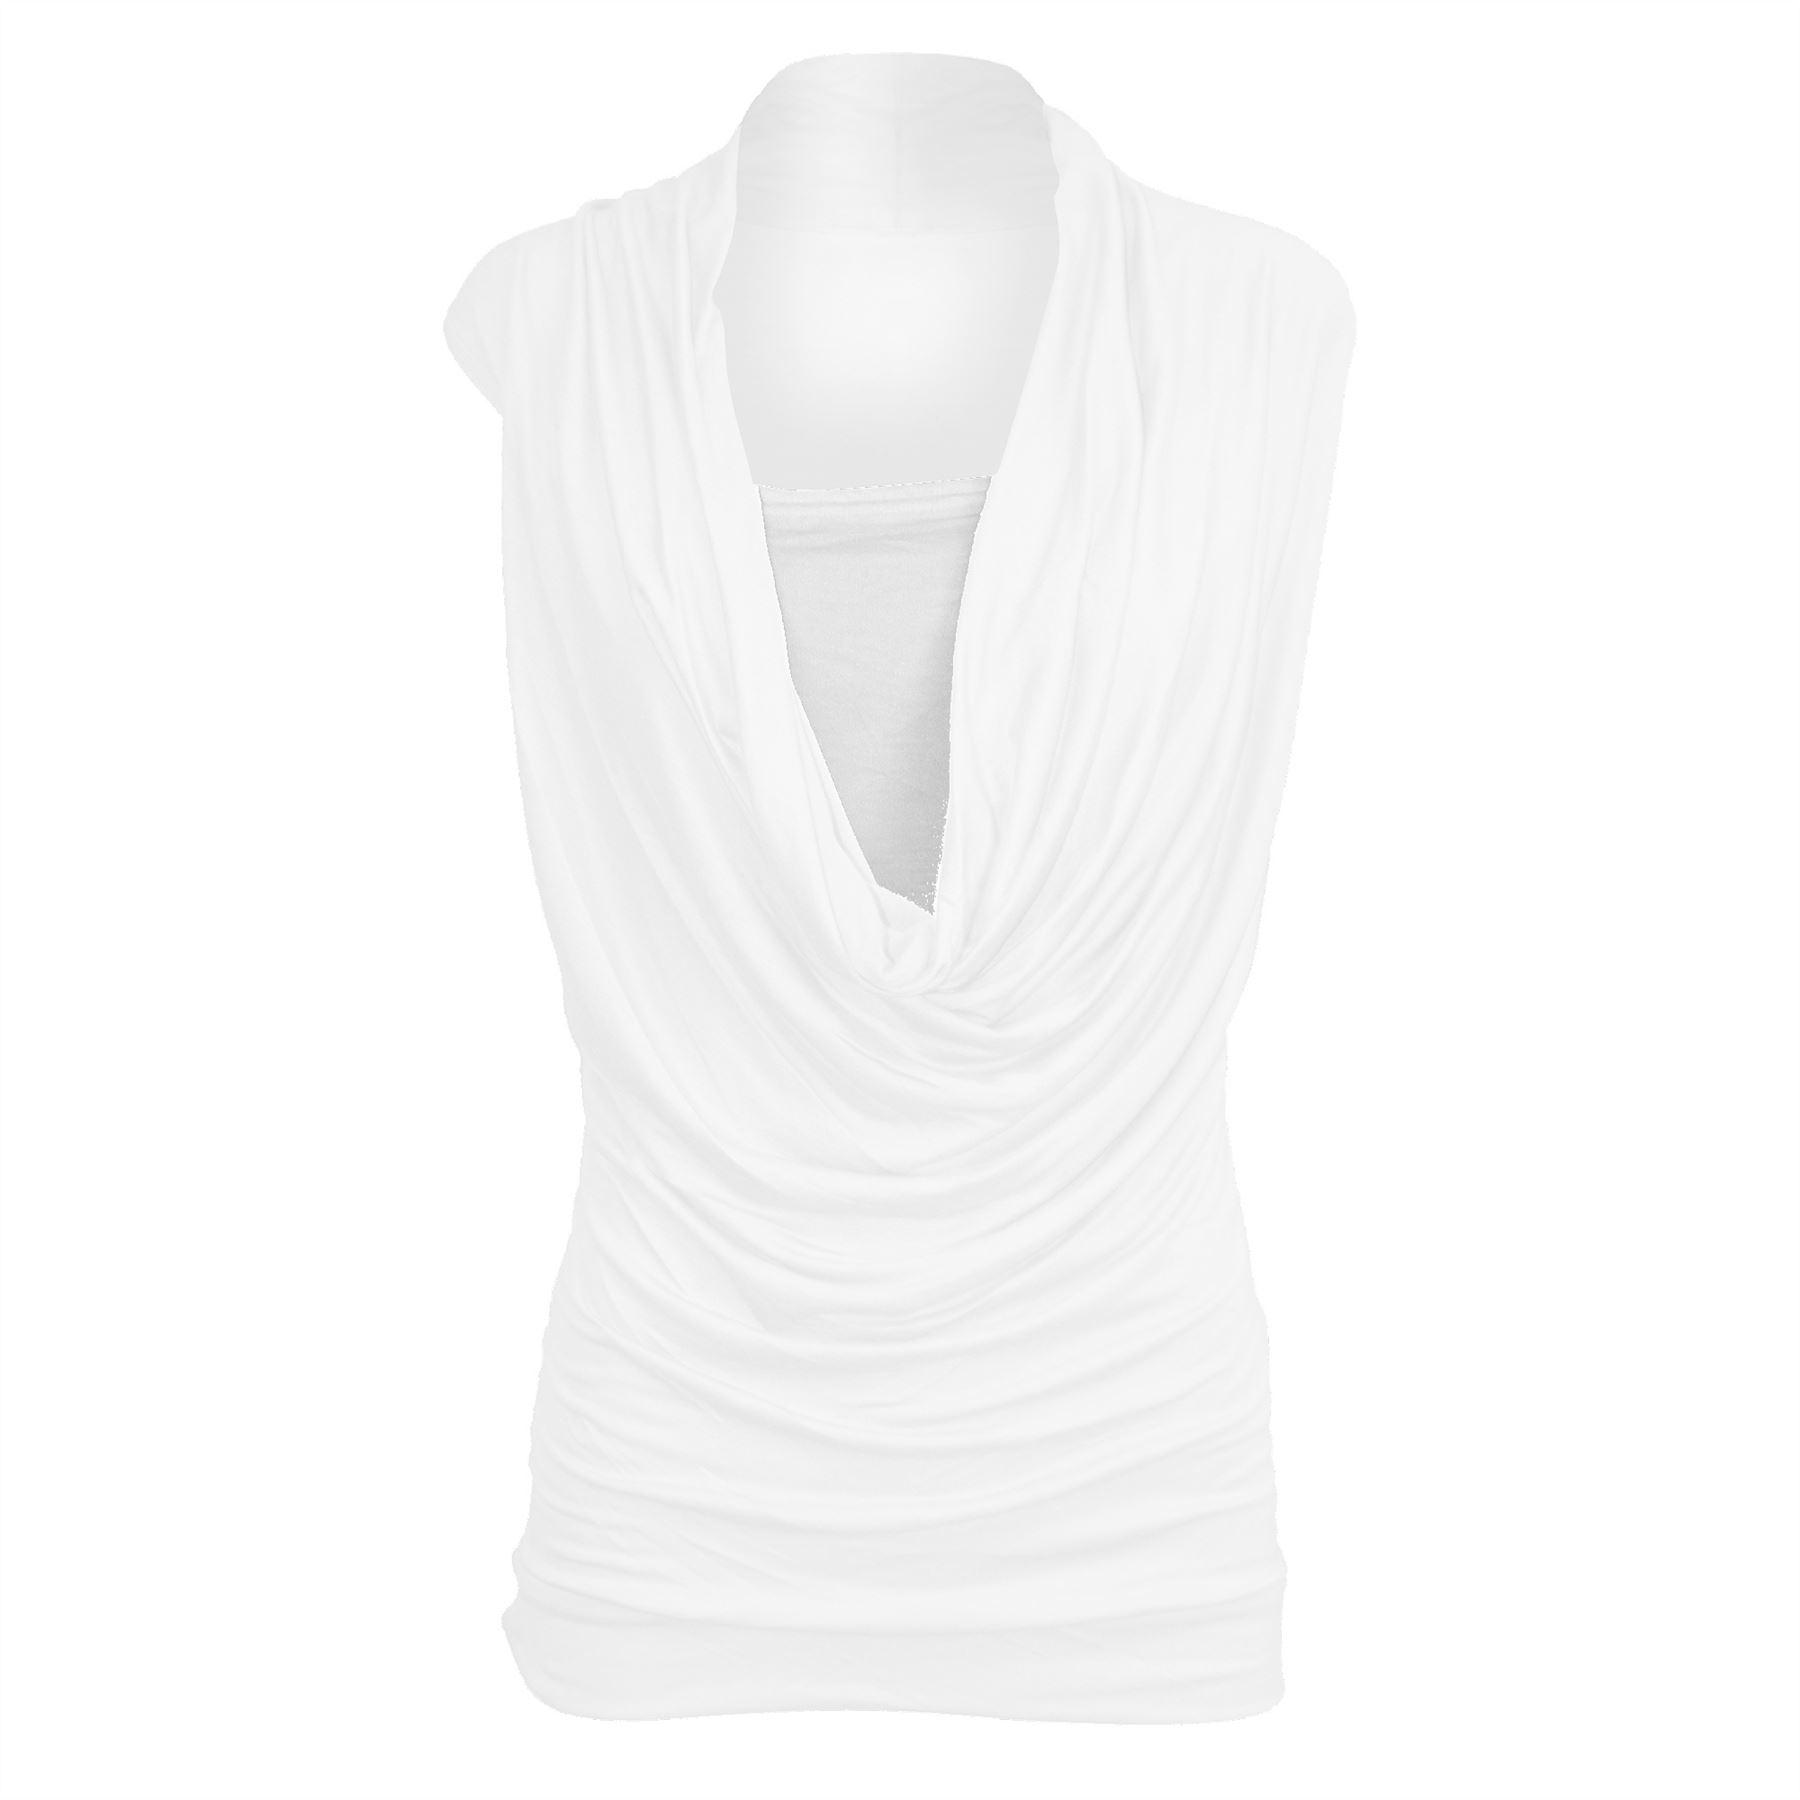 Womens Ladies Sleeveless Cowl Neck Vest Jersey T Shirt Top